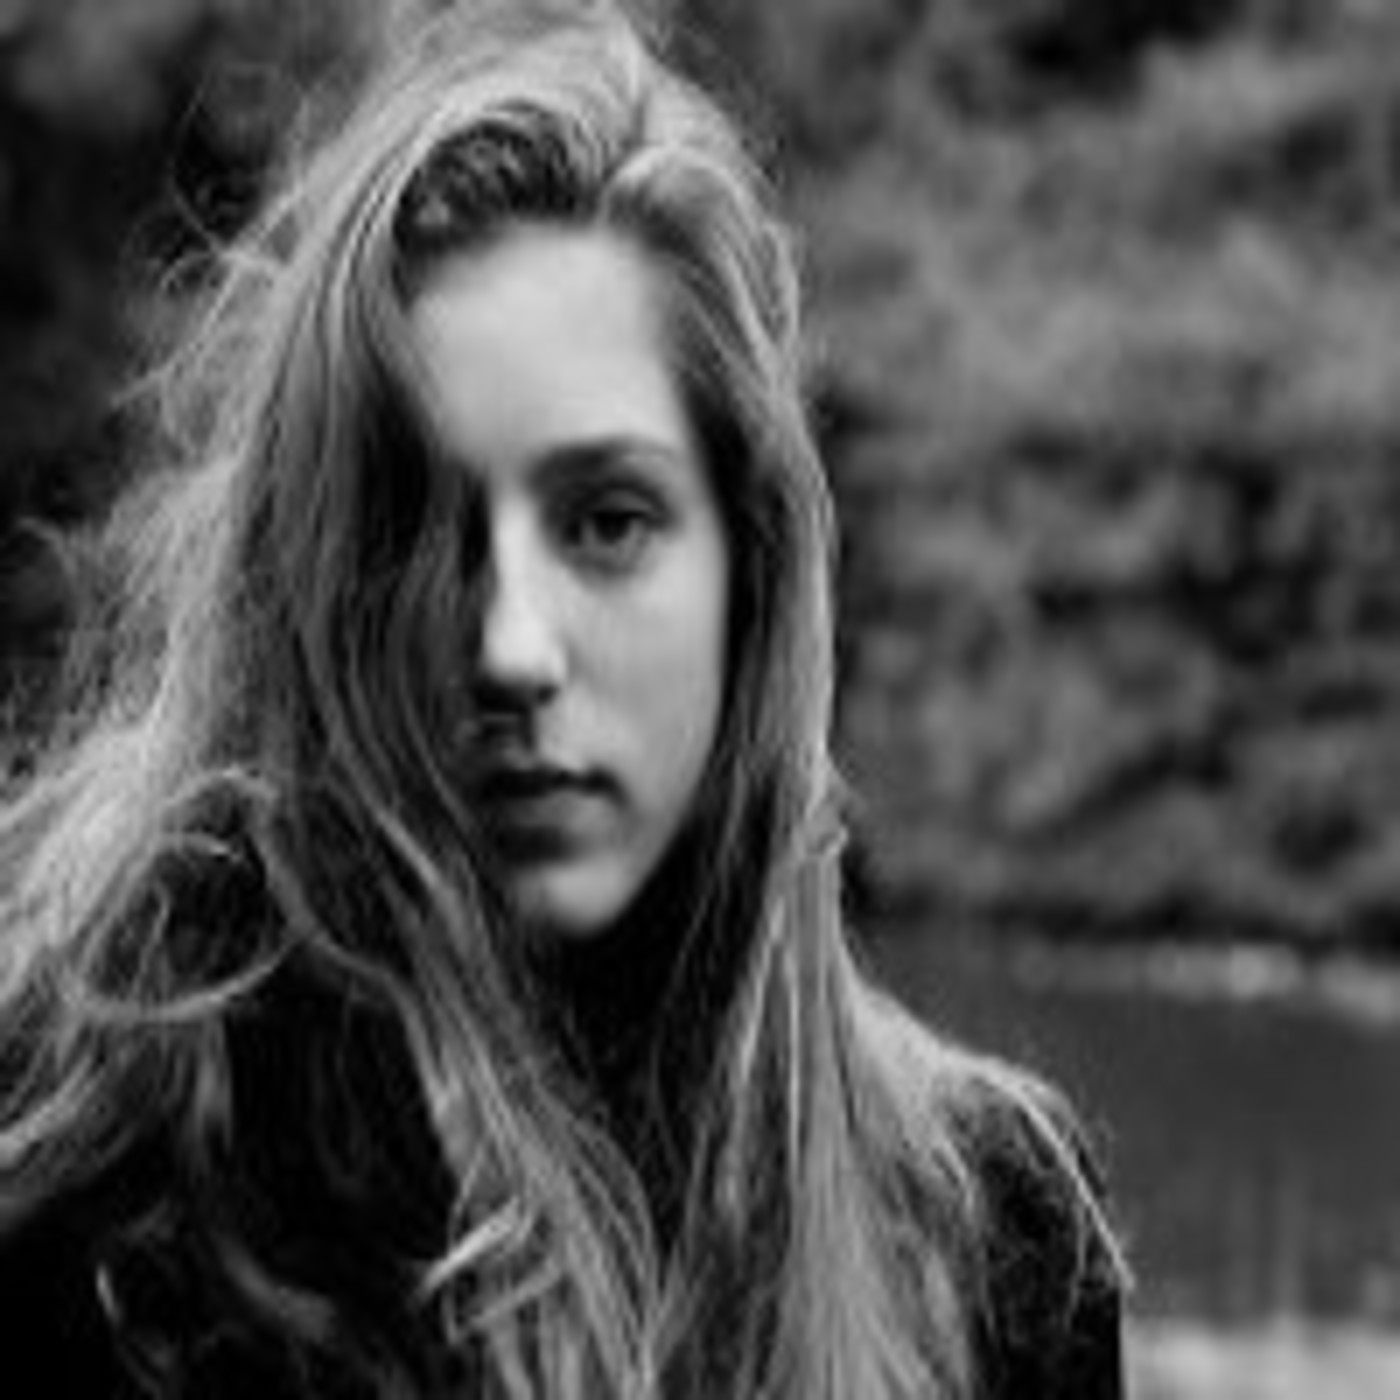 Wings - Birdy en Podcast de Josefina en mp3(12/04 a las 05